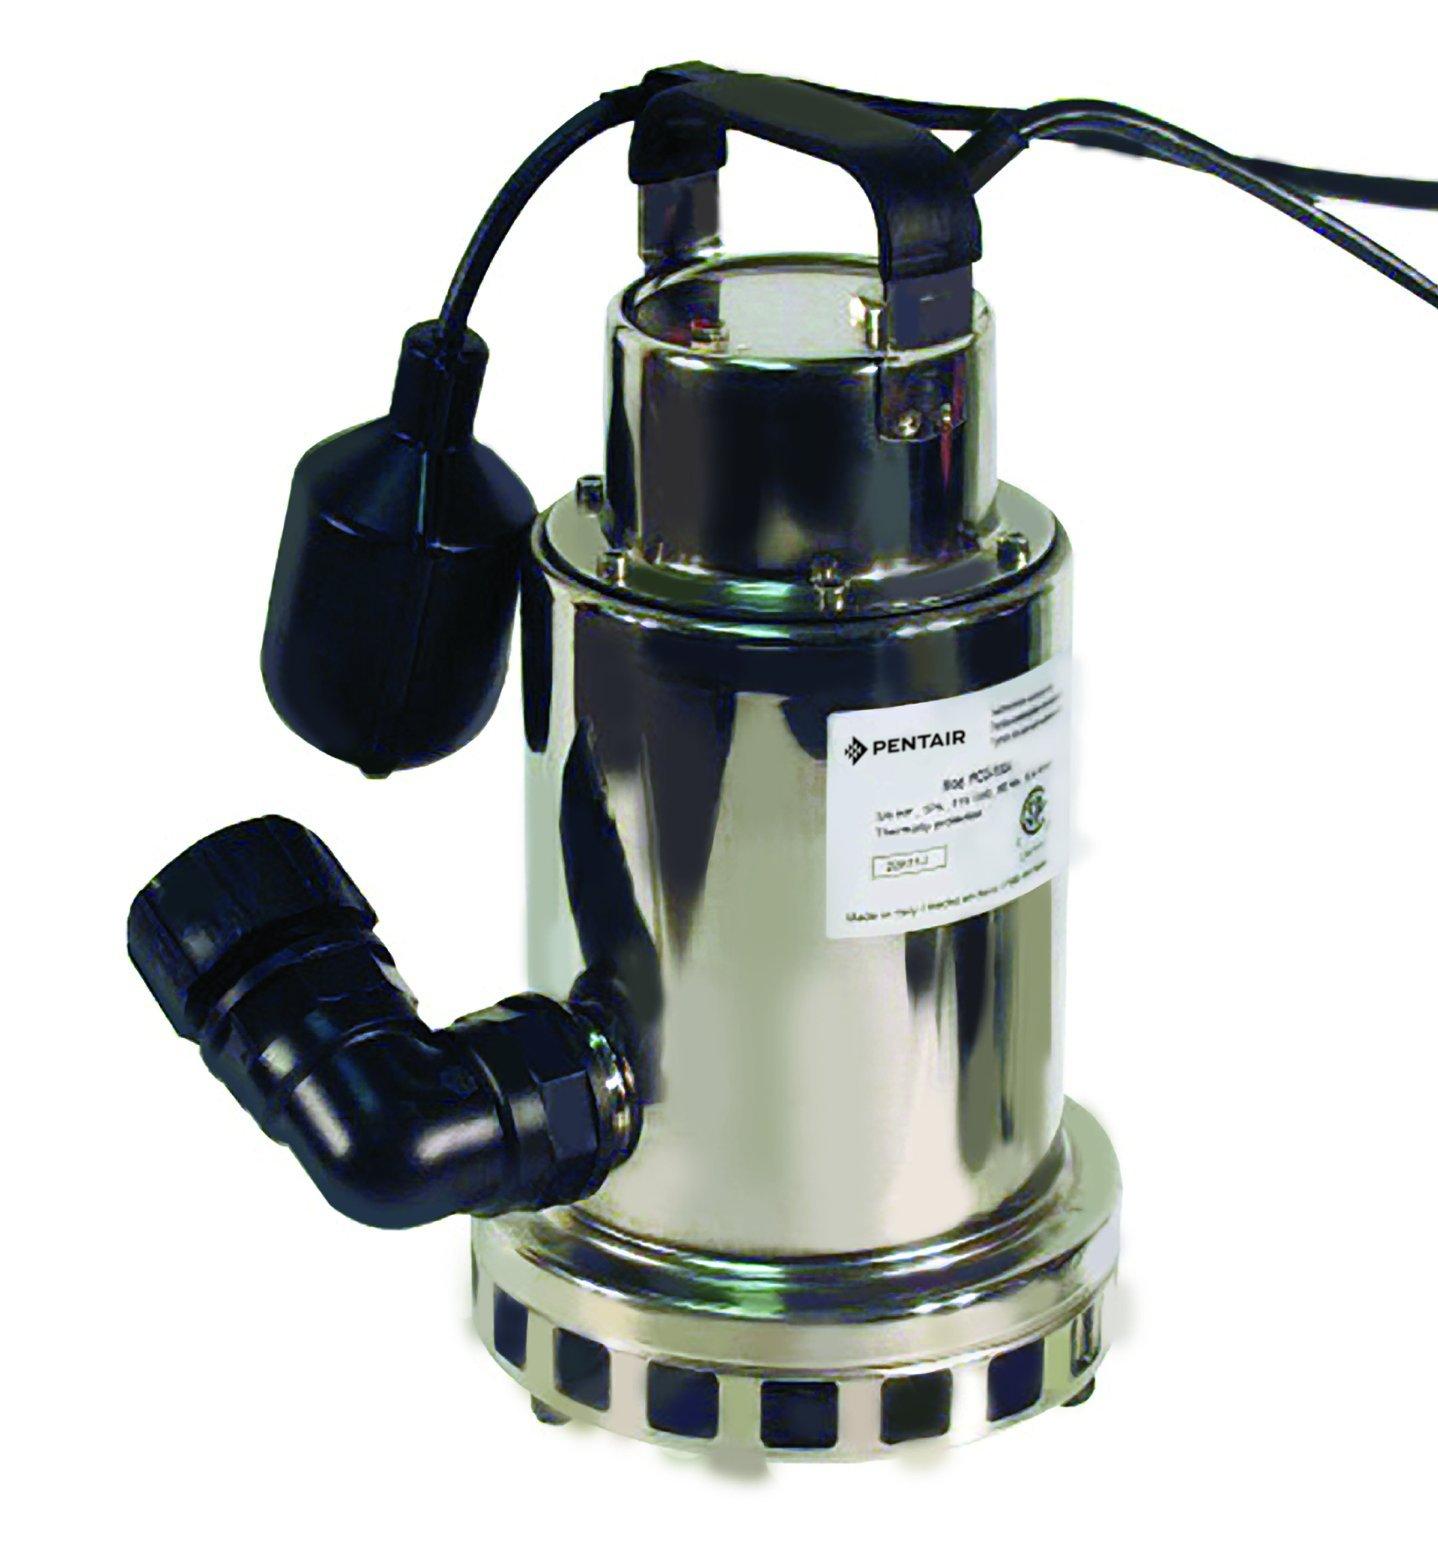 Pentair PCD-1000 Submersible Pump